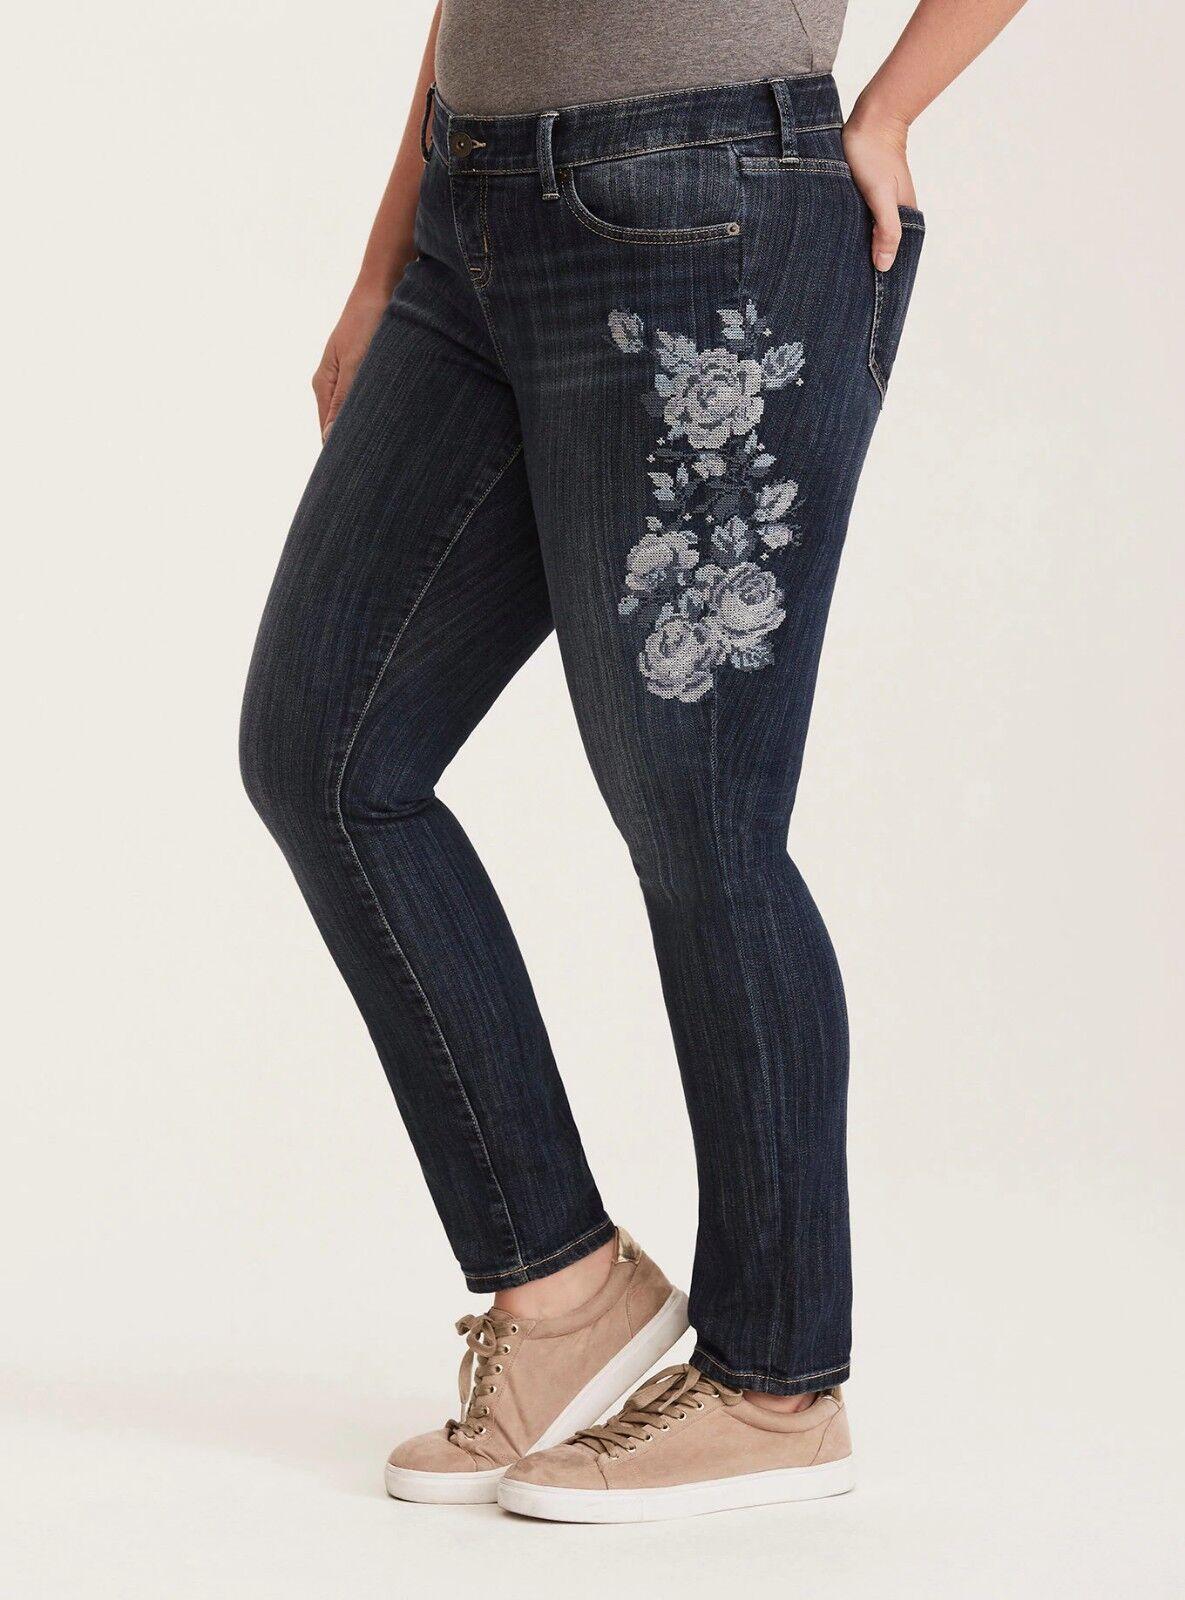 Torrid Floral Embroidered Skinny Stretch Jeans Dark Wash Sz 12